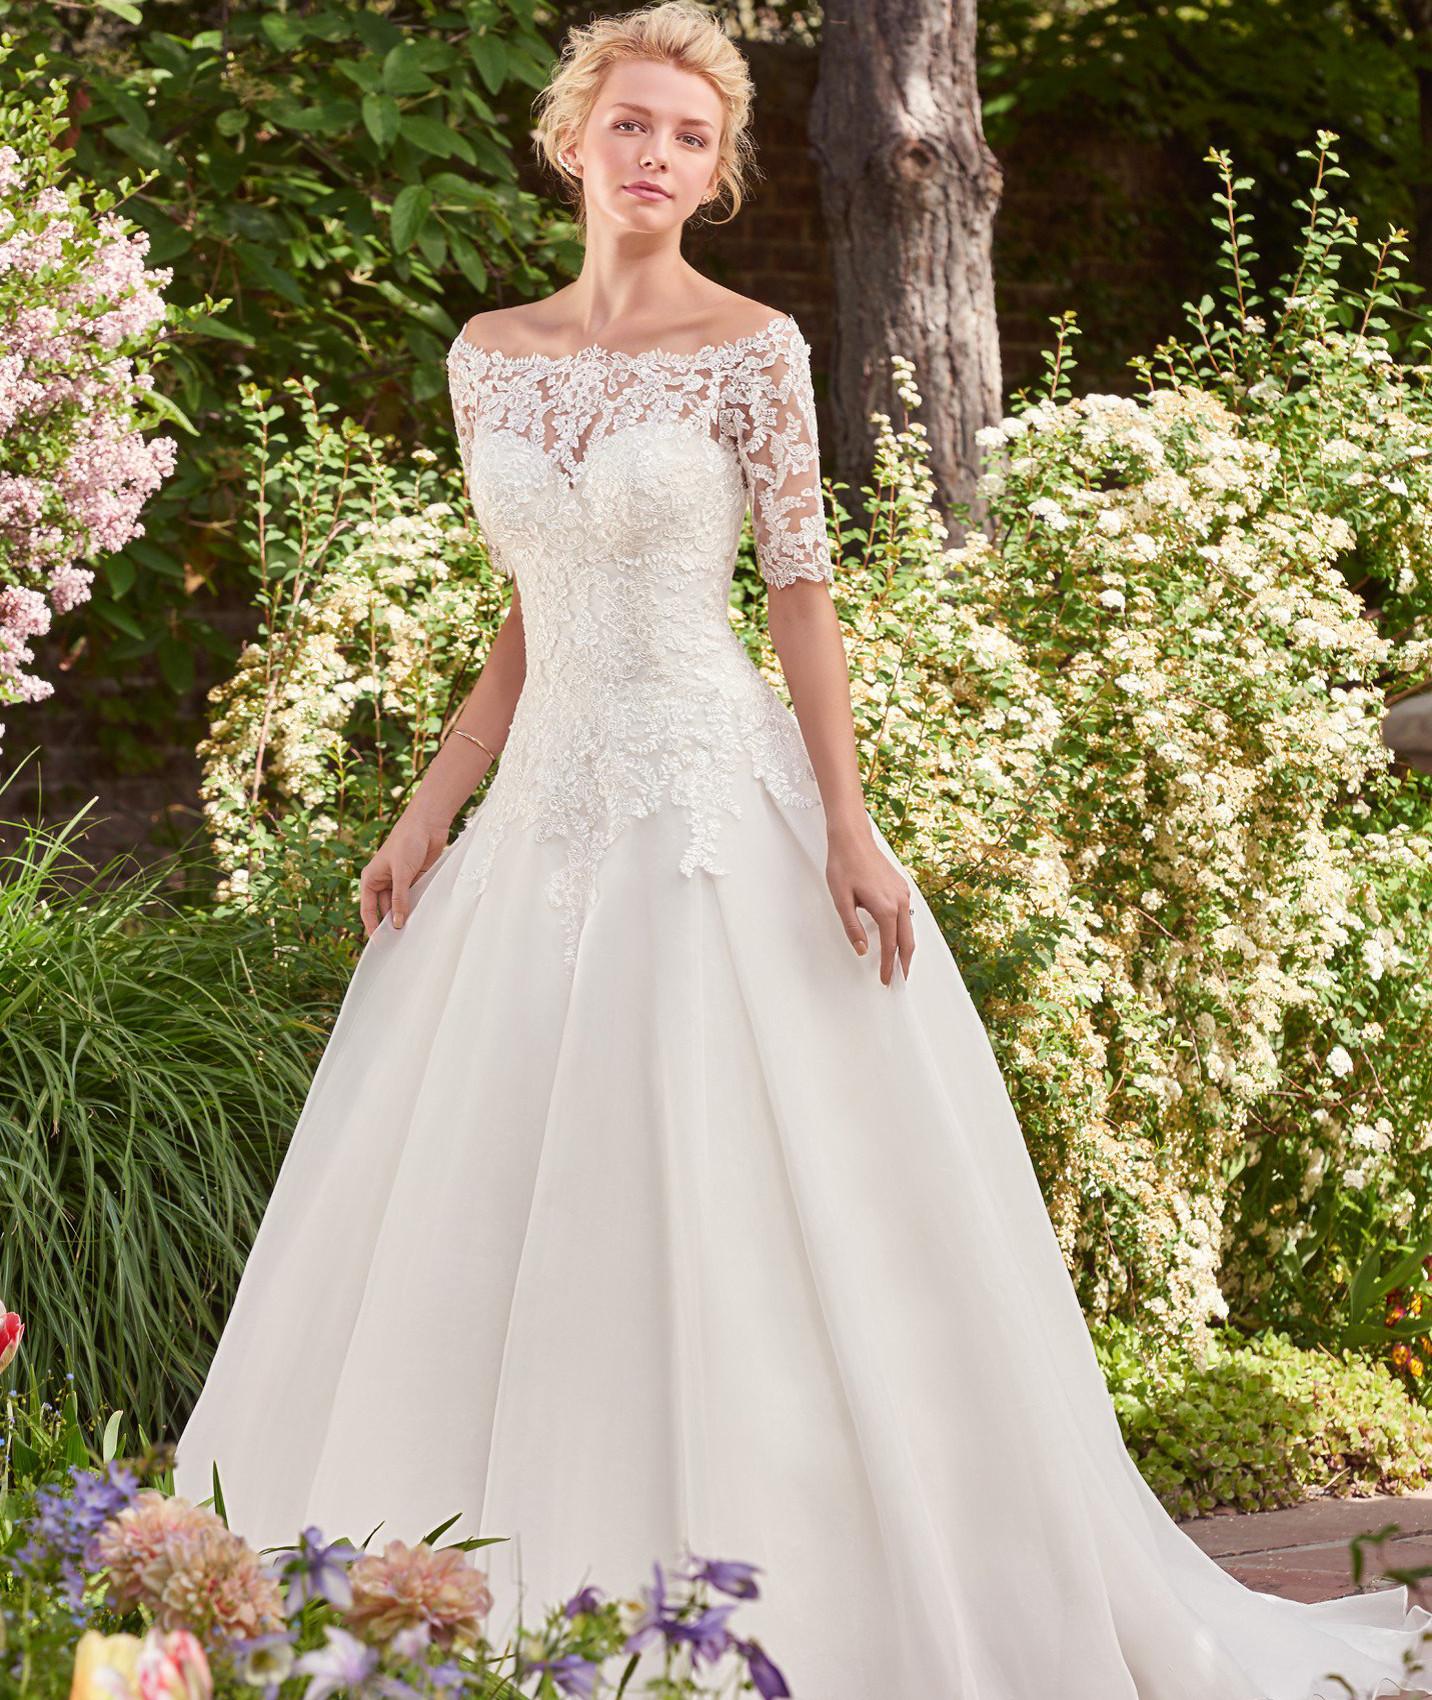 Maggie Sottero Свадебные платья